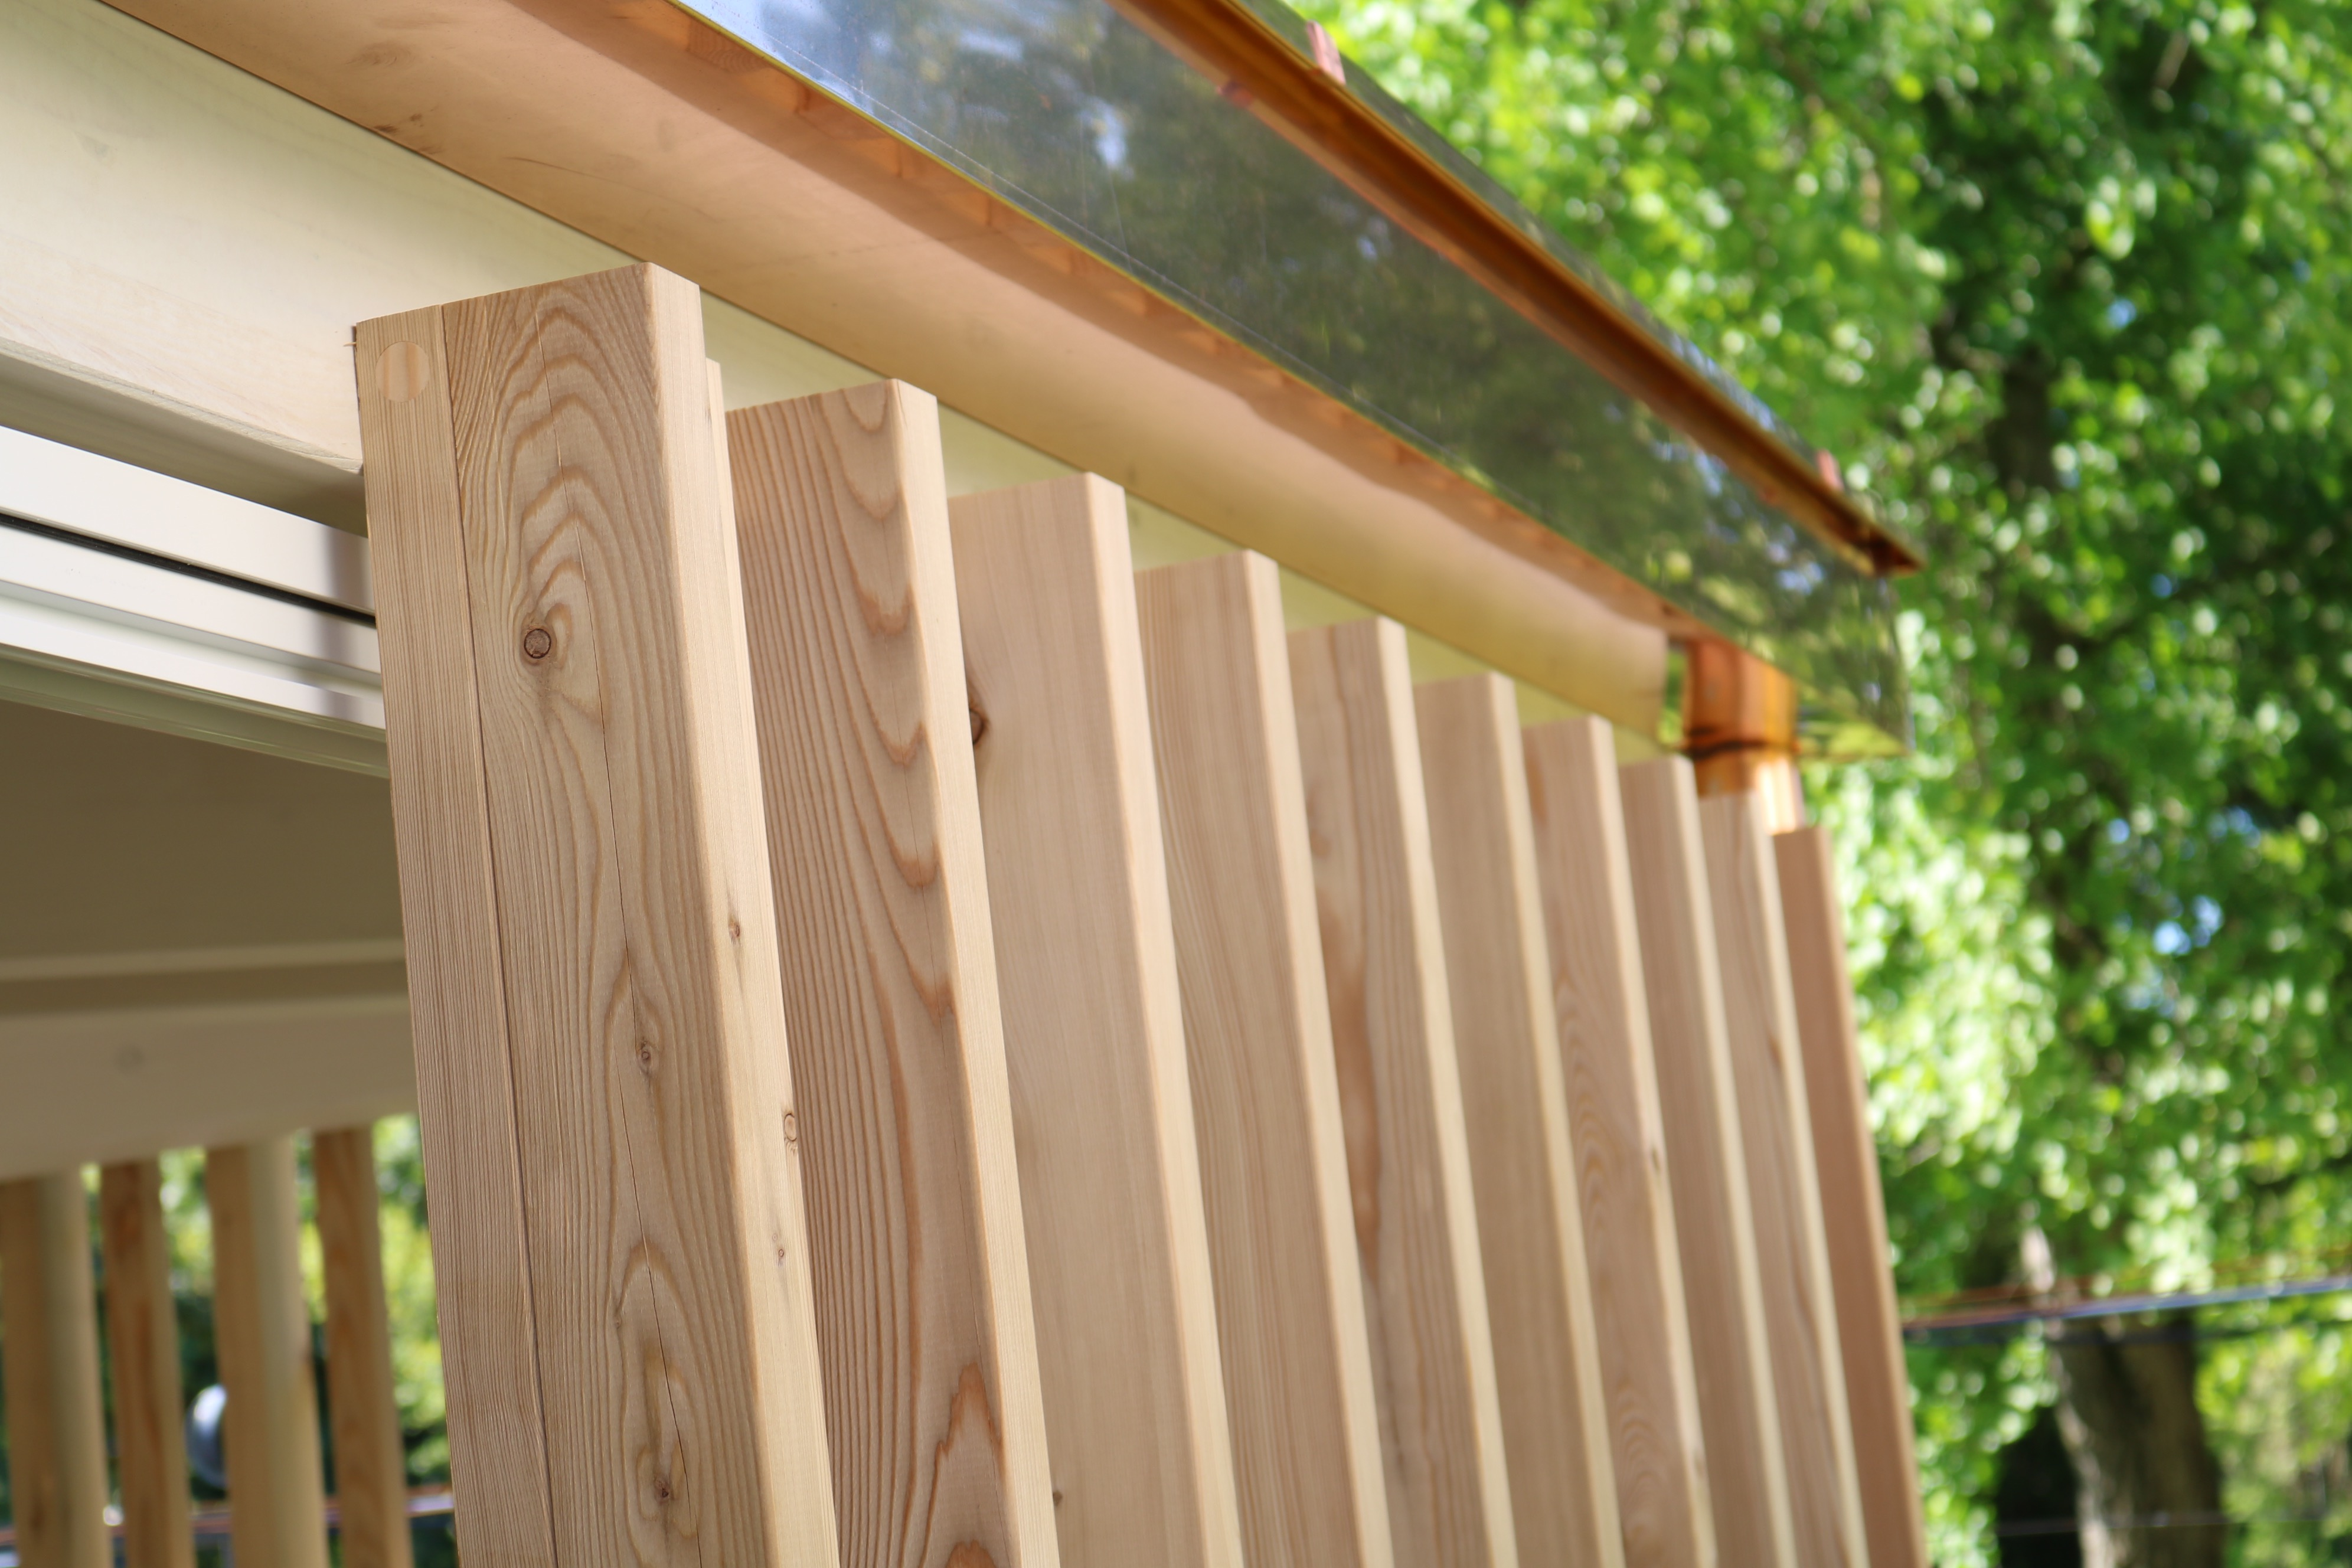 Gazebo in legno da giardino 5 stars jove for Legno da rivestimento pareti